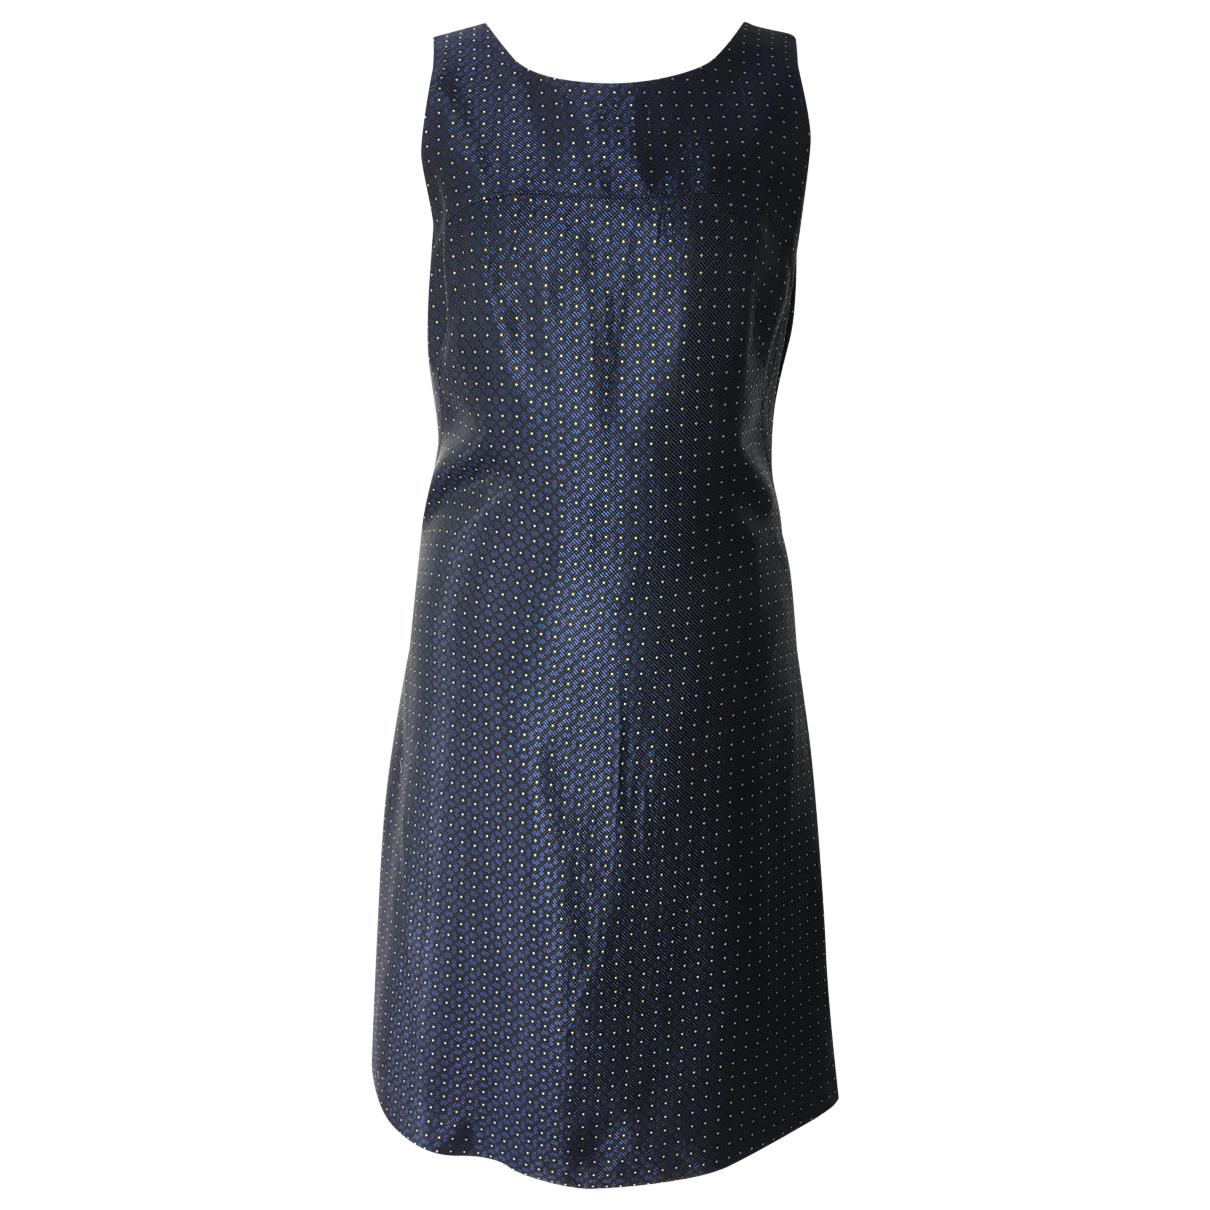 Tara Jarmon \N Navy dress for Women 36 FR